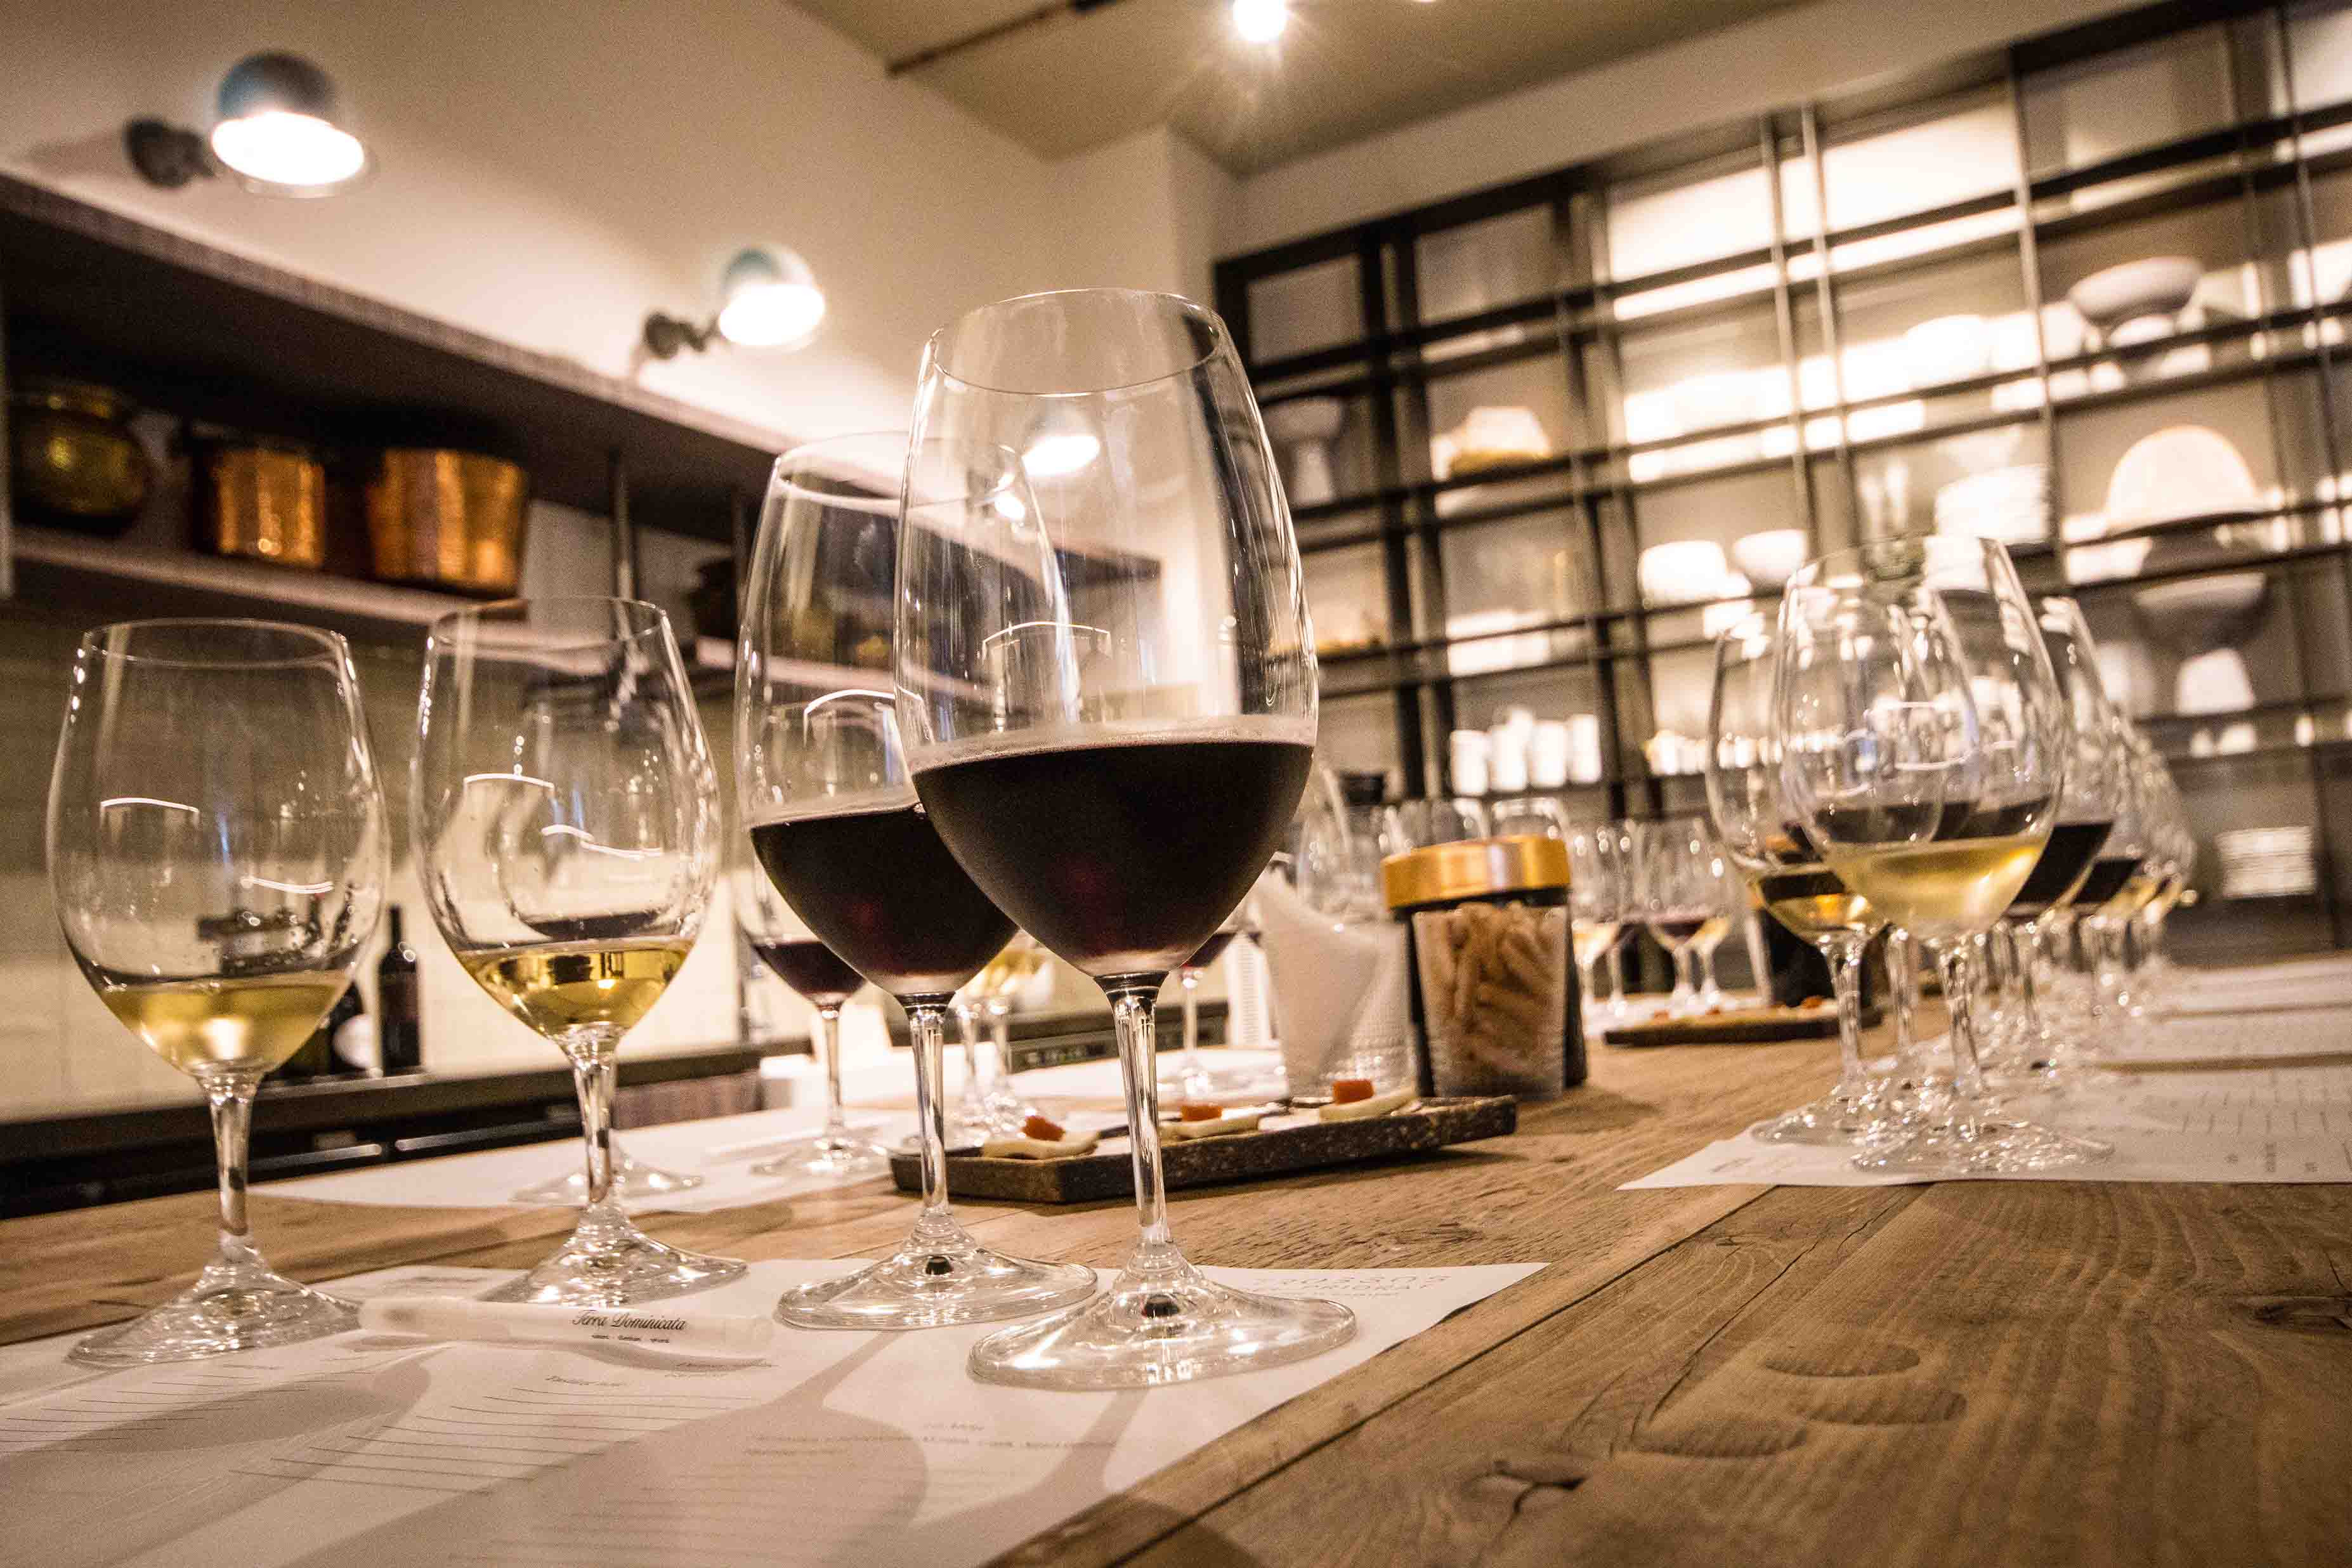 Winery tour+tasting at Terra Dominicata